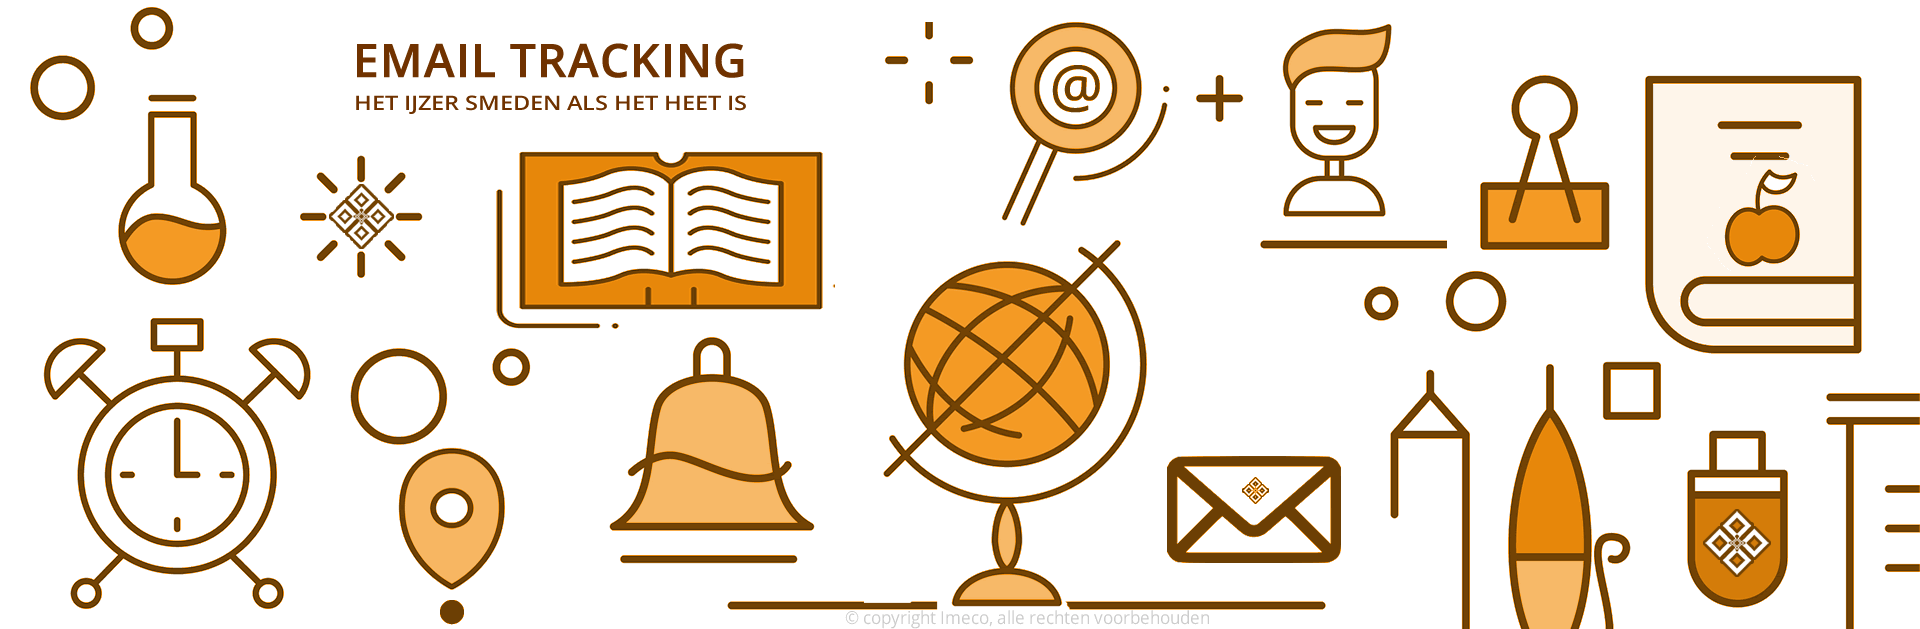 Weergave van email tracking systemen